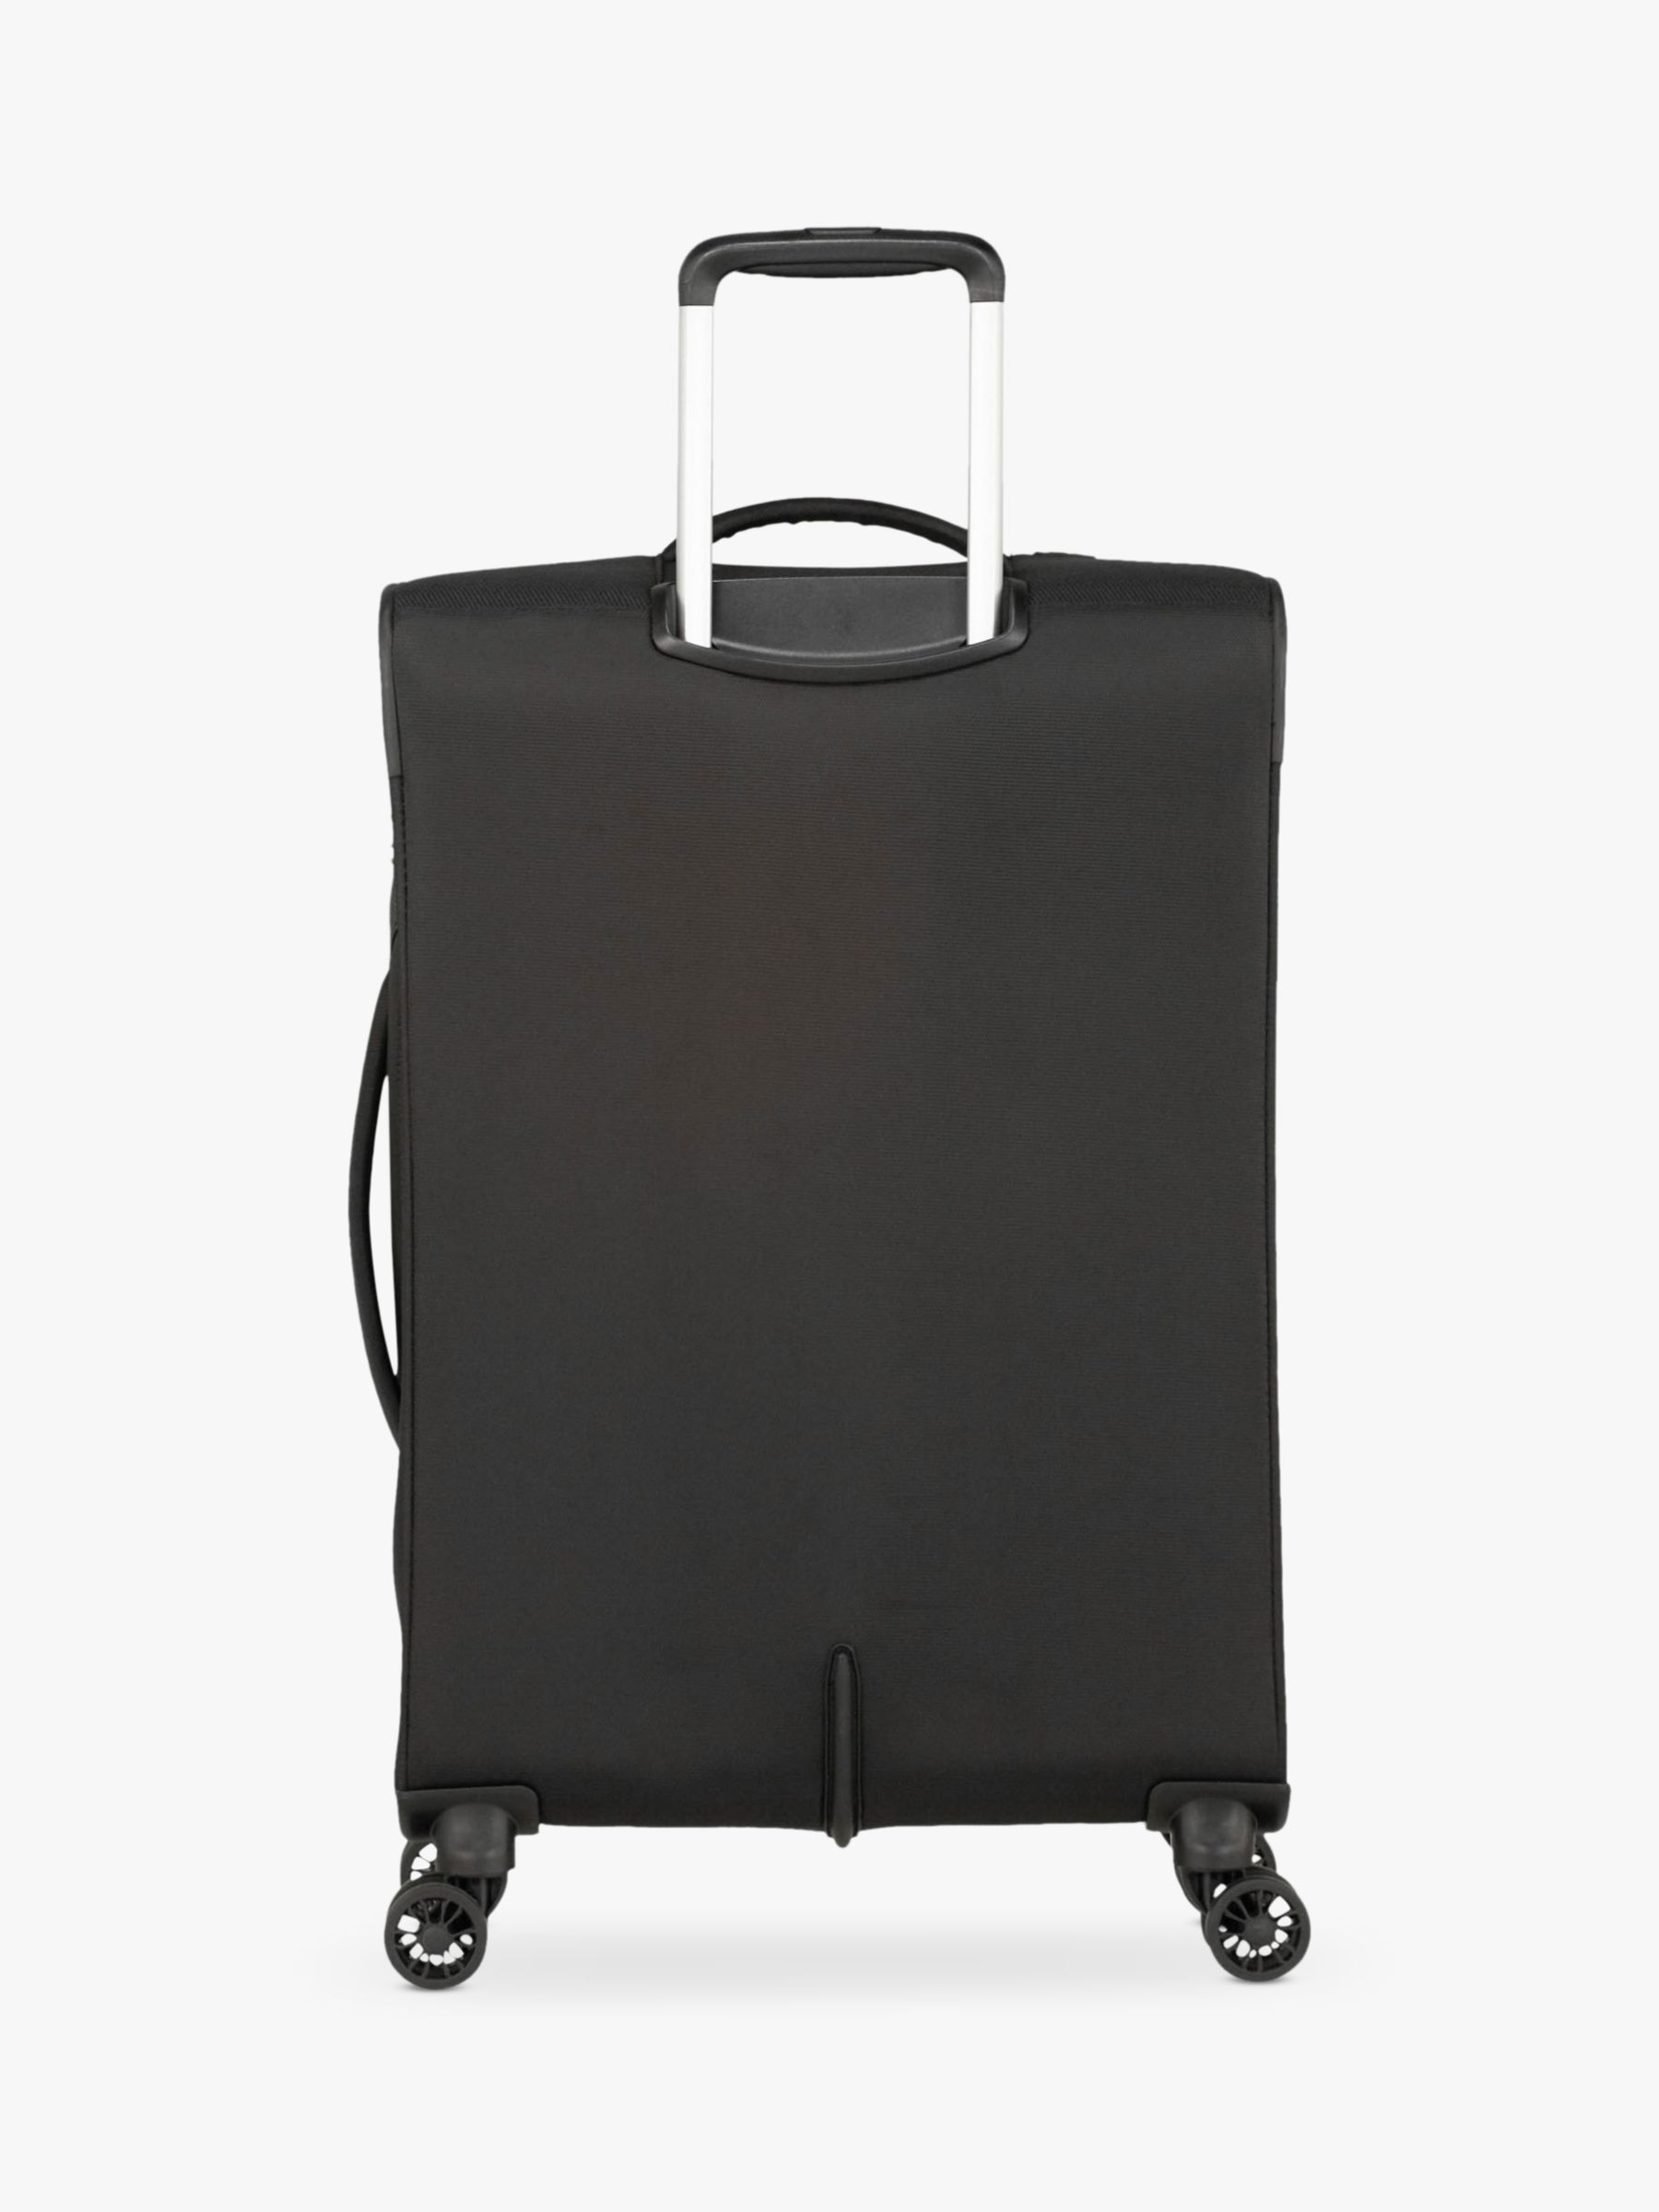 American Tourister American Tourister Summer Funk 4-Spinner 67cm Medium Case